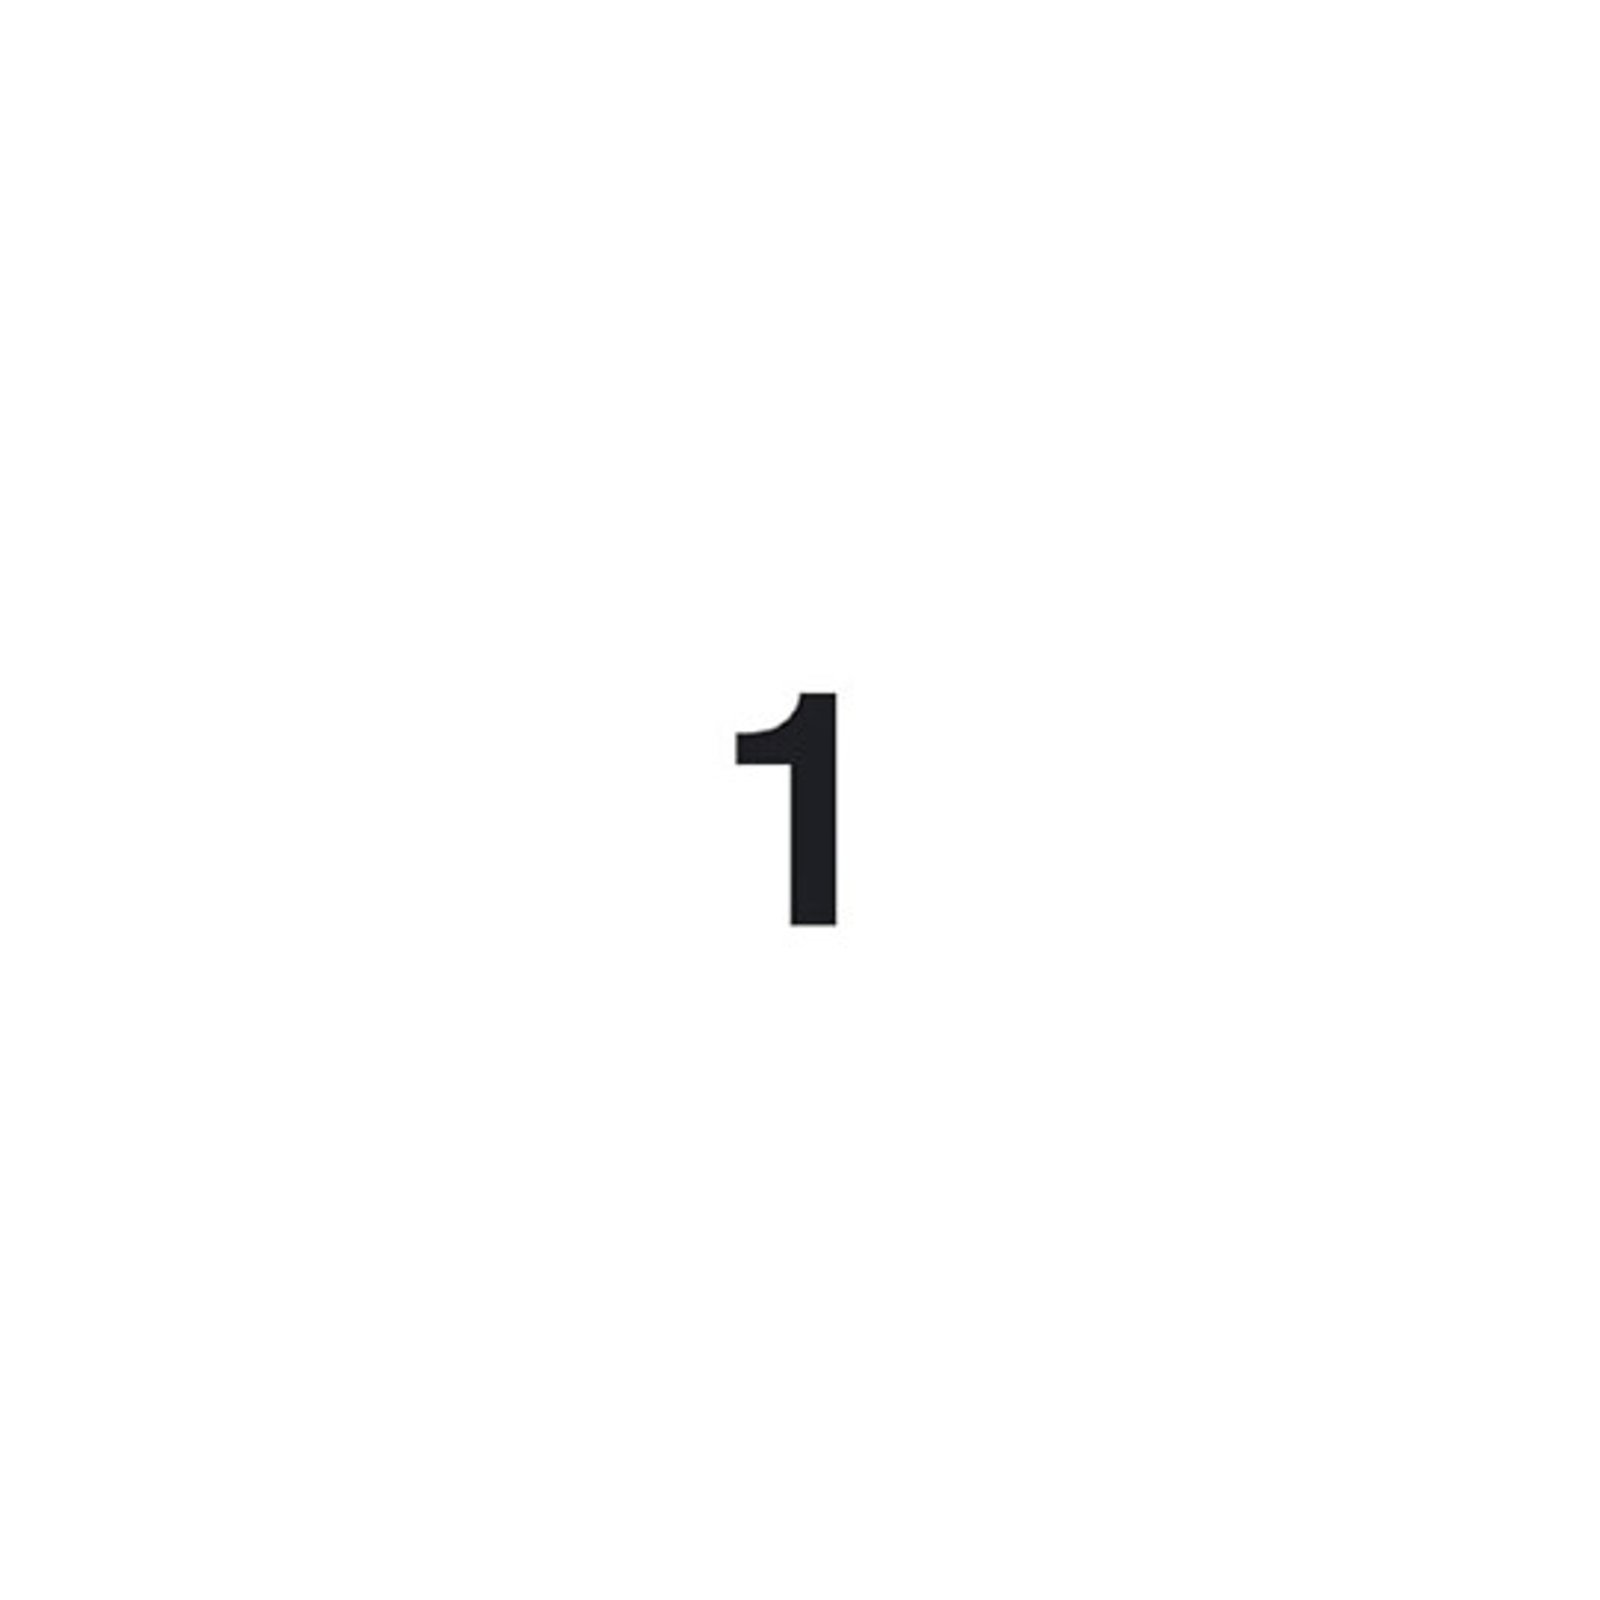 Selvklebende tallet 1